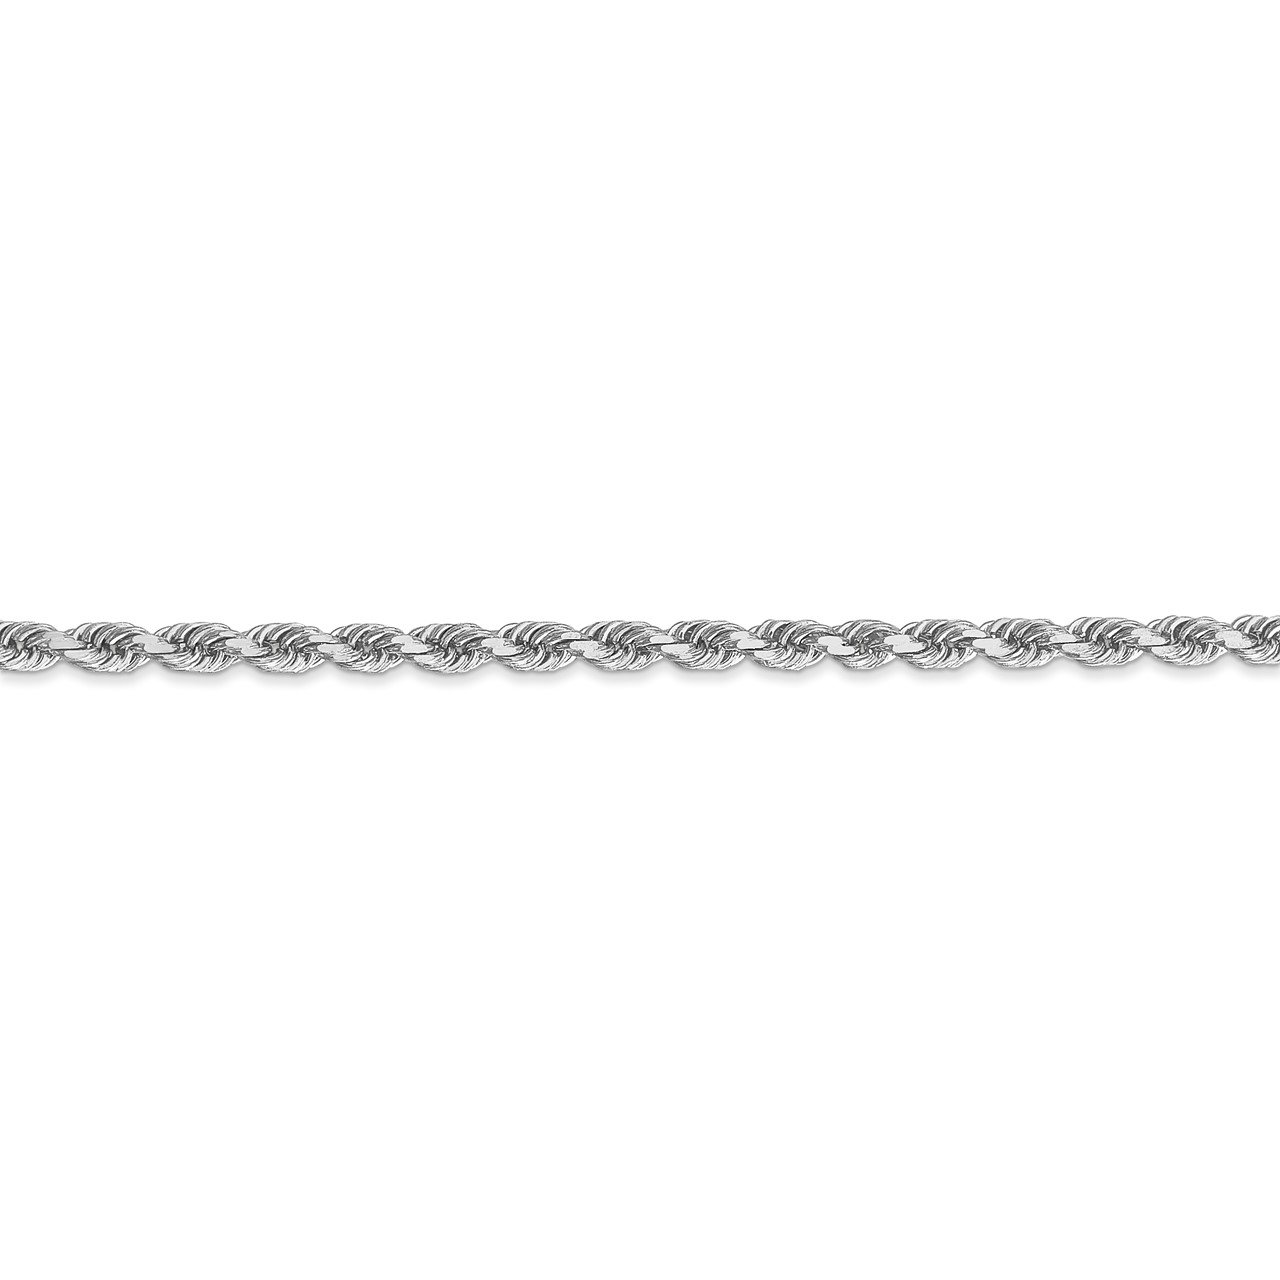 Leslie's 14K White Gold 3mm Diamond- cut Rope Chain-2